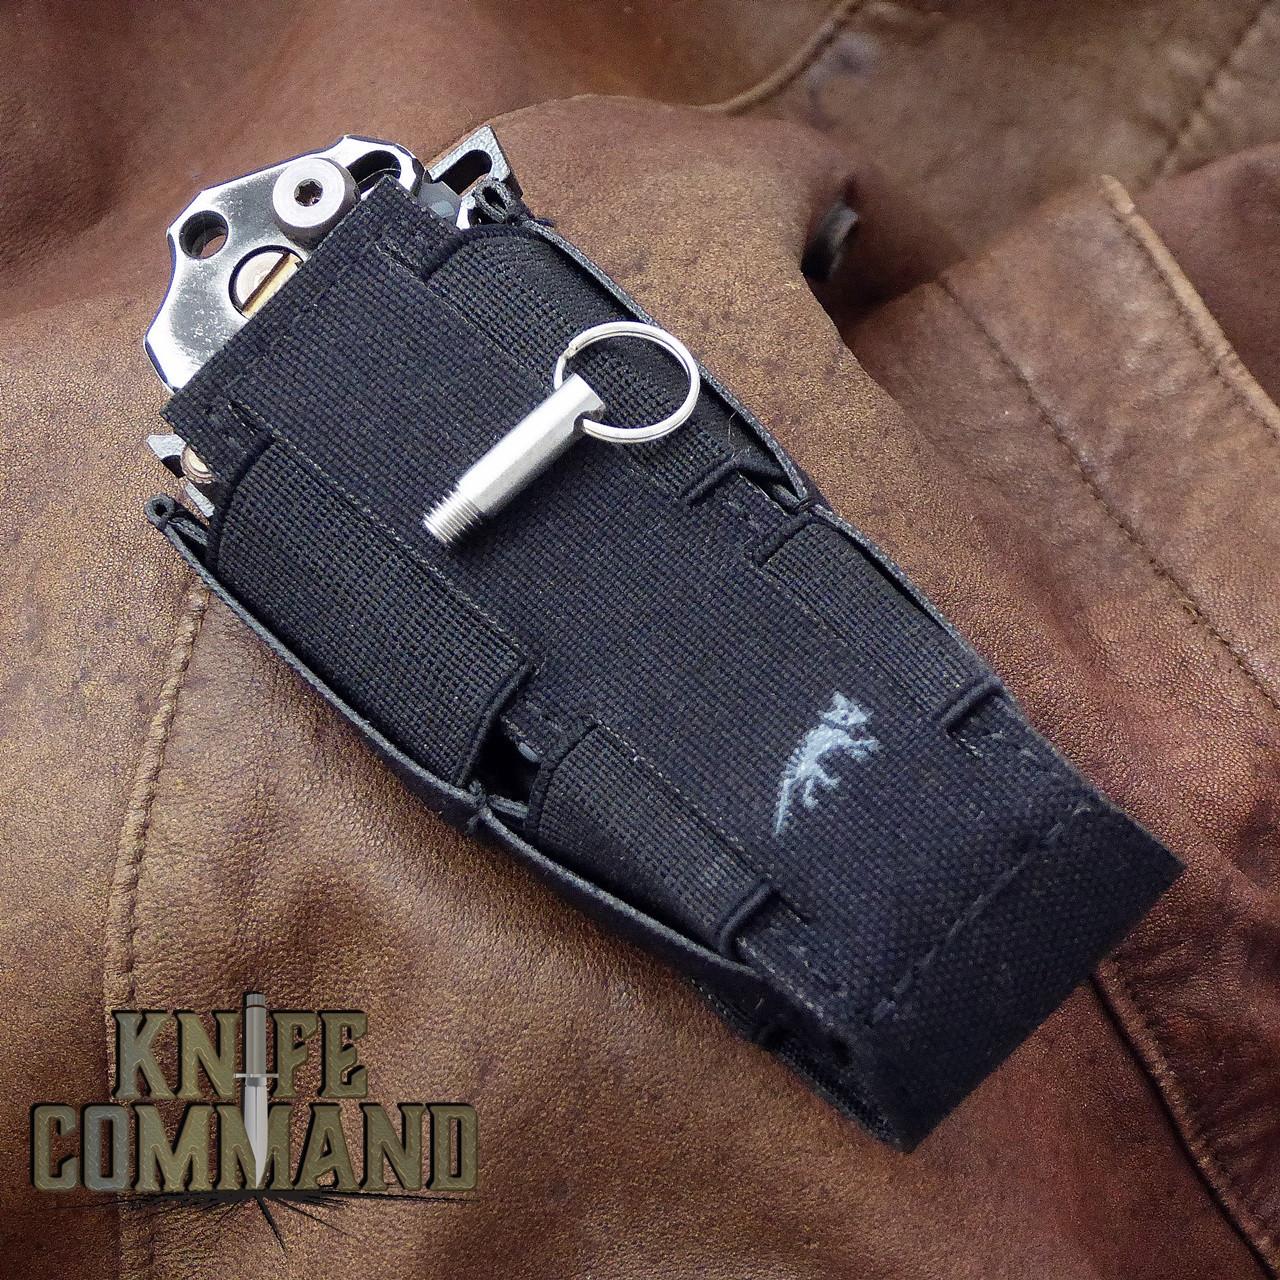 Knife, Tatonka sheath, and lock pin included.